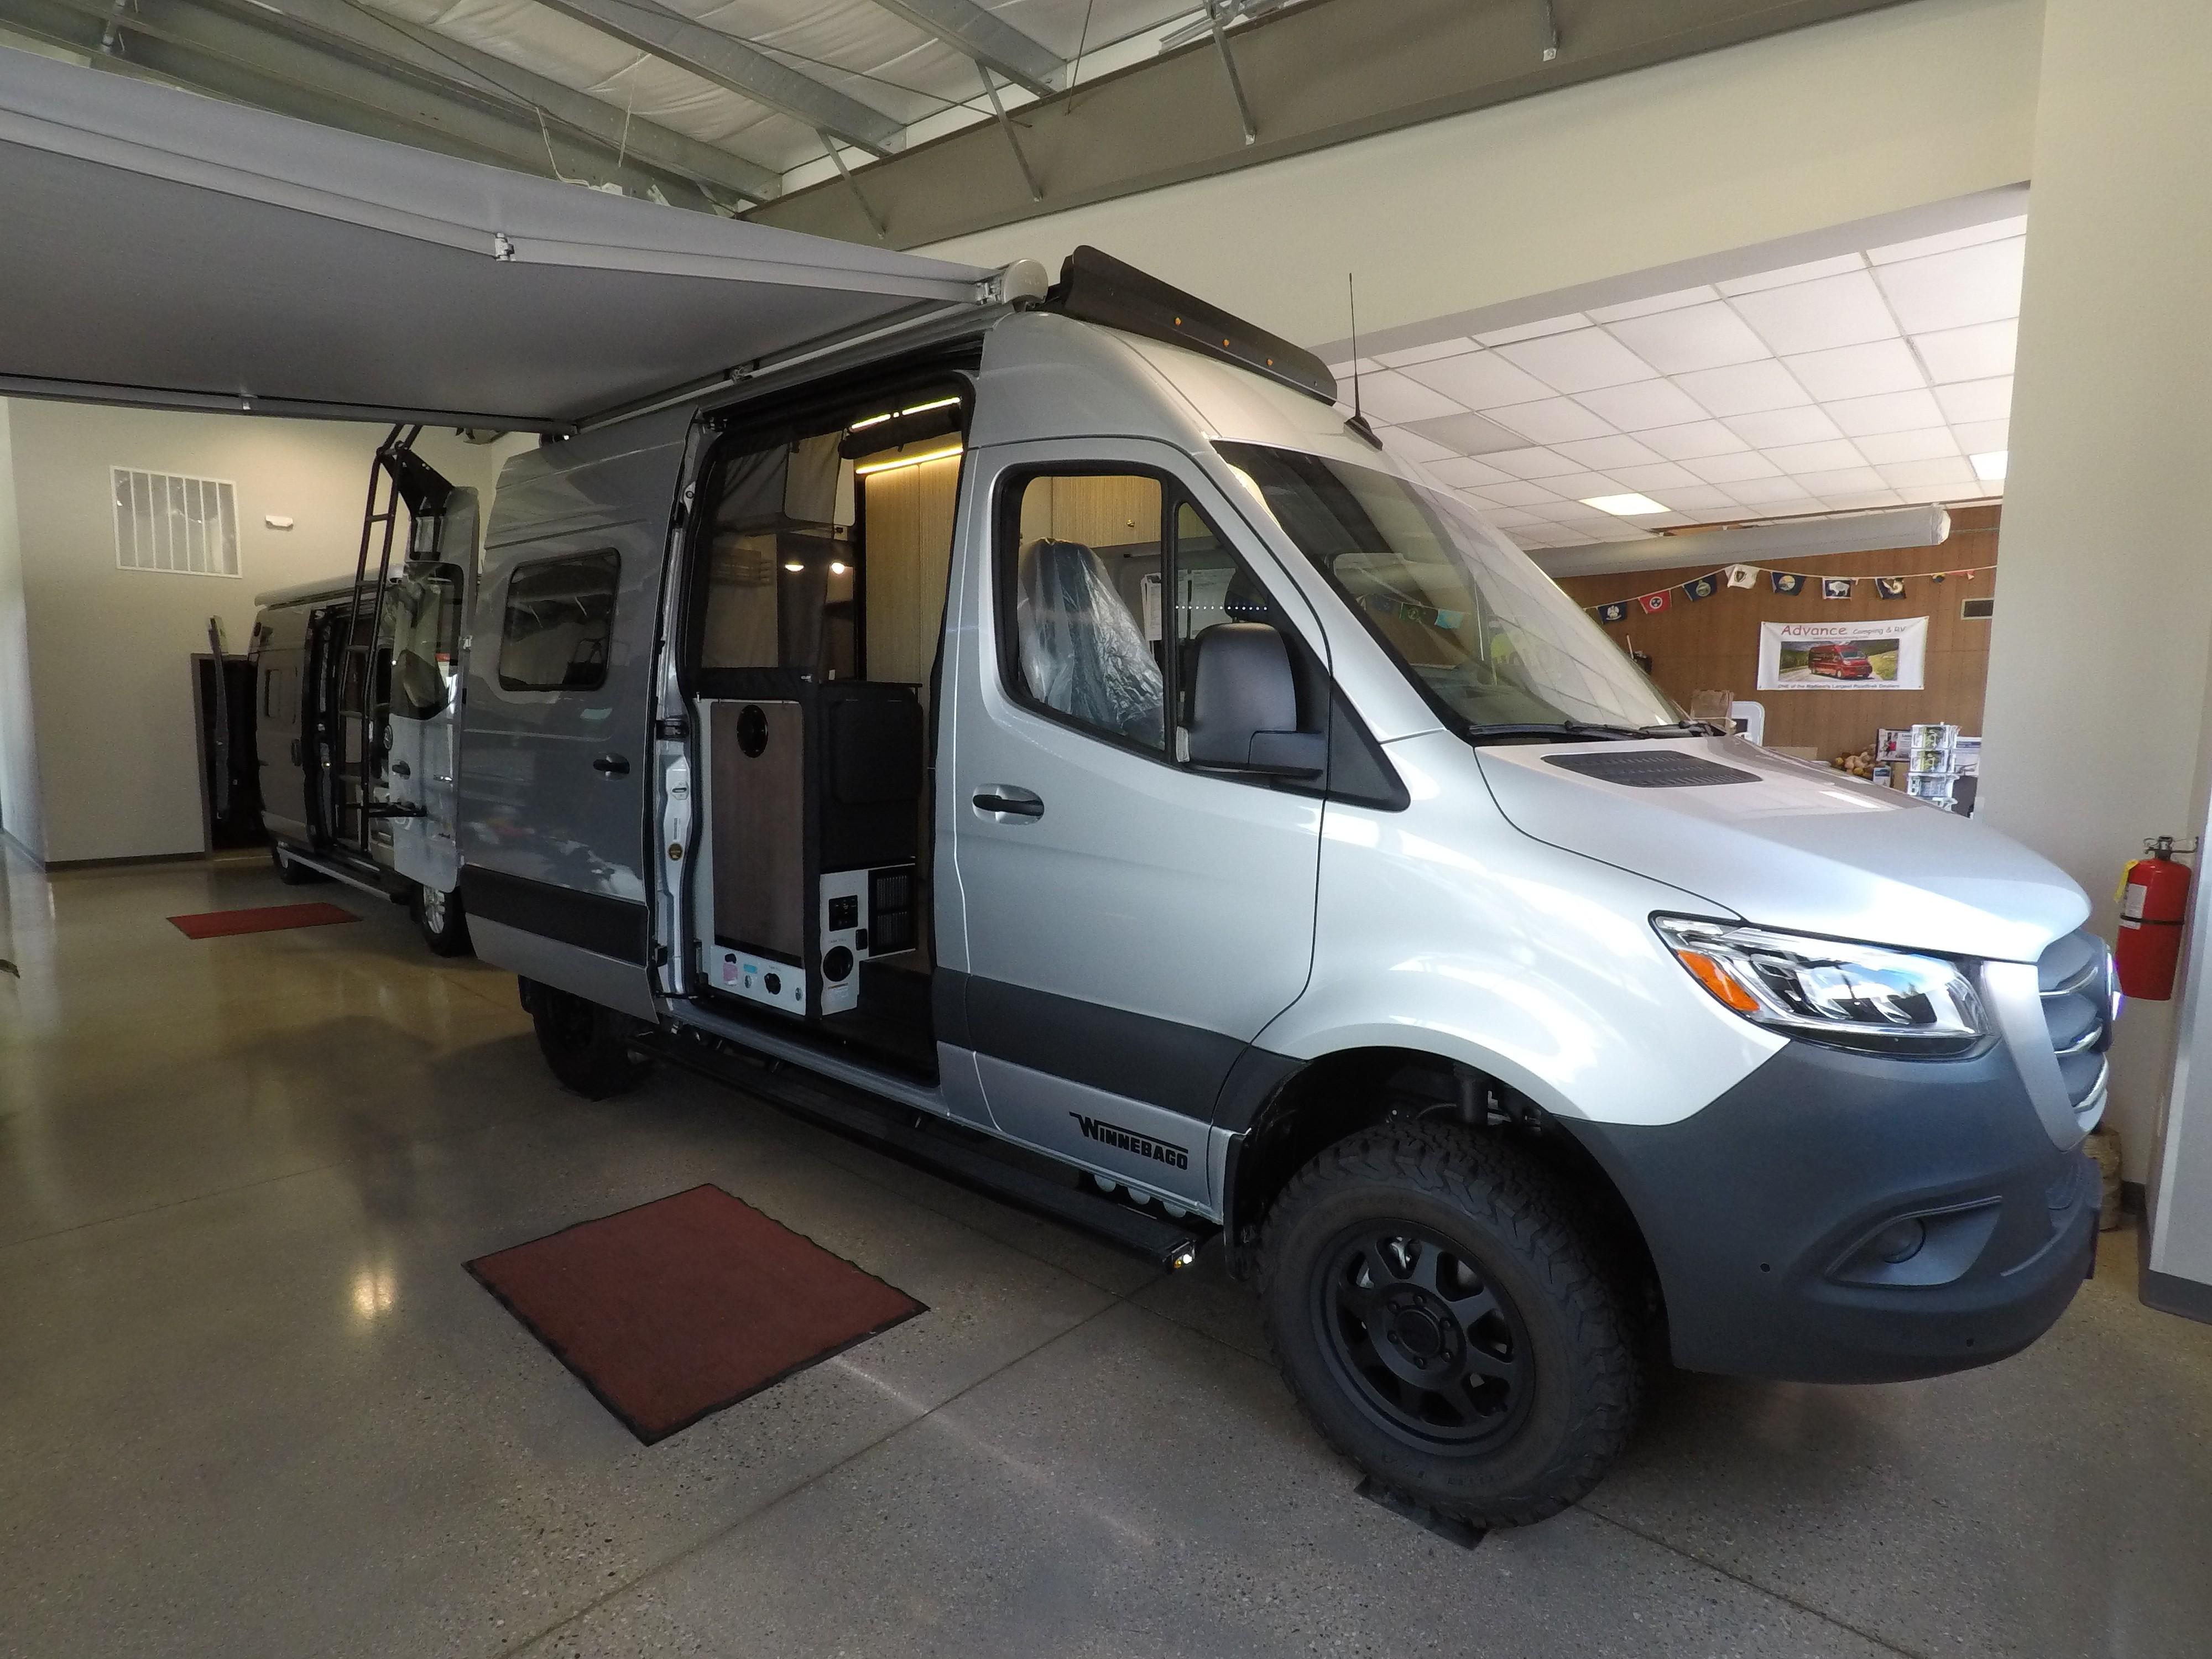 Advance Camping Sales, Featuring KZ, Pleasure Way, Winnebago